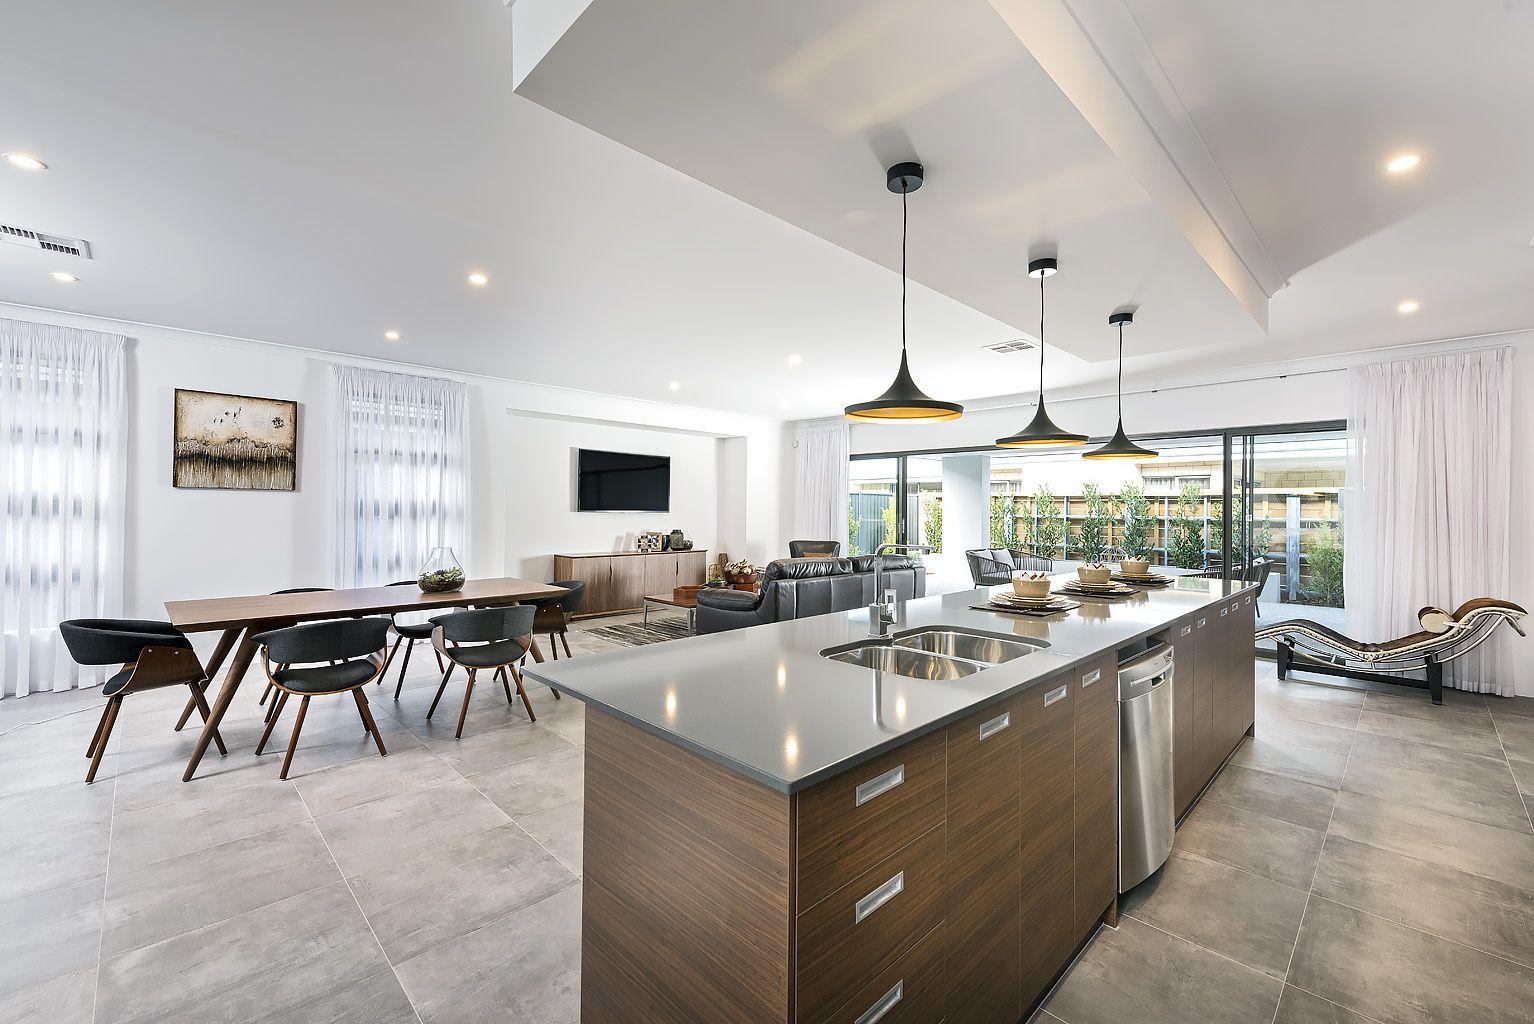 A Bulkhead Over The Kitchen Creates A Sense Of Depth And